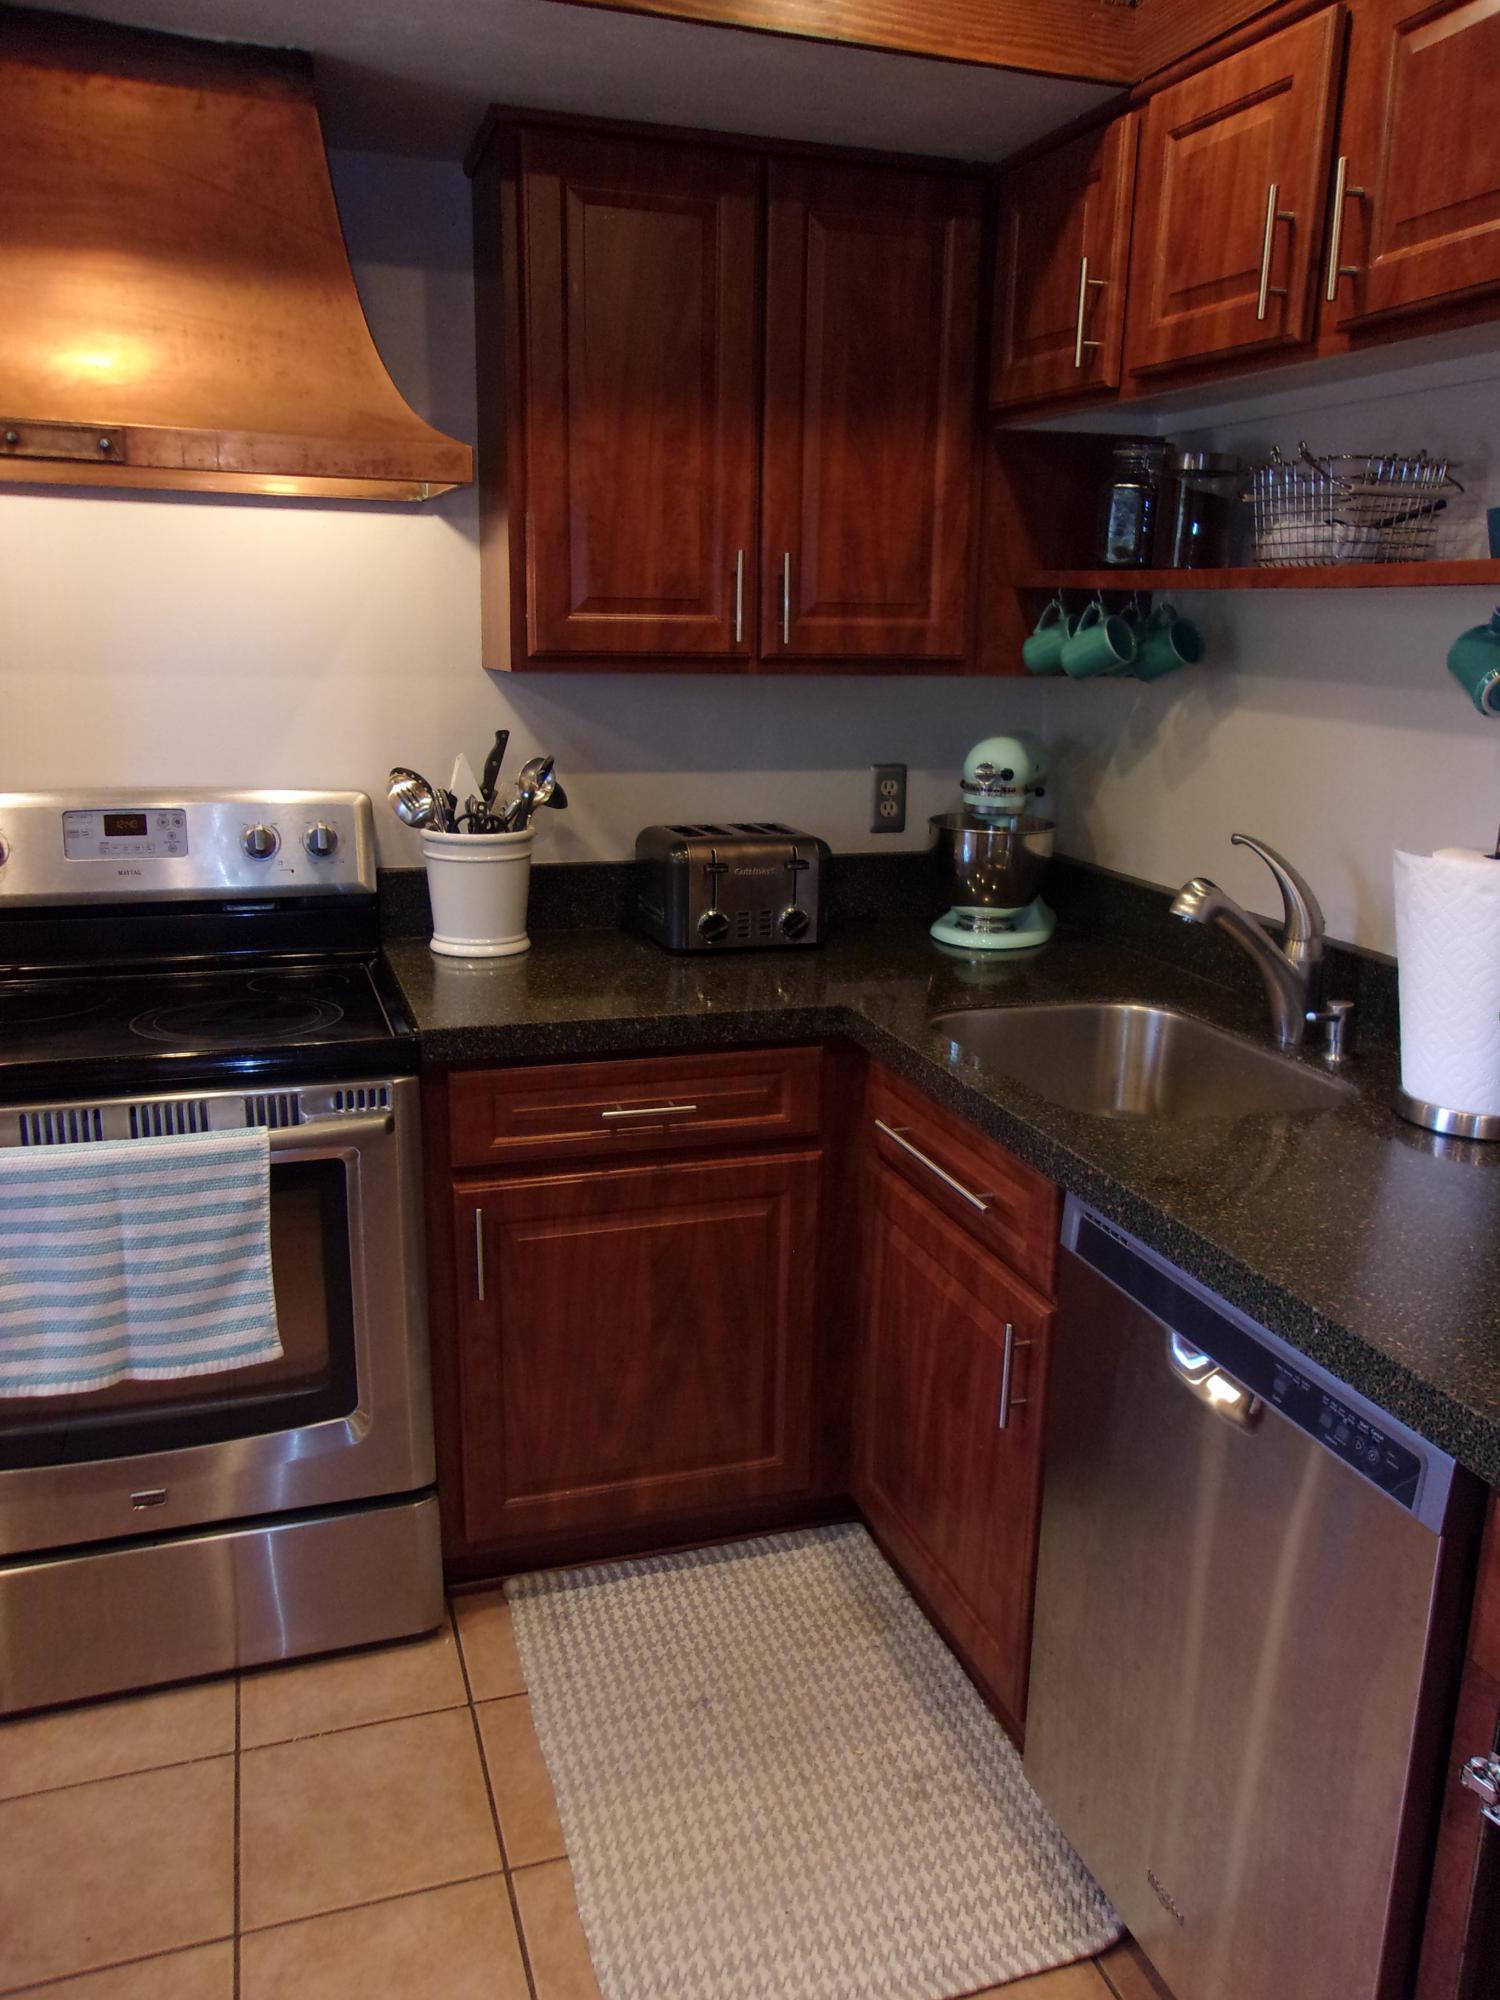 1501 Lafayette Drive, Columbus, Ohio 43220, 2 Bedrooms Bedrooms, ,2 BathroomsBathrooms,Residential,For Sale,Lafayette,220025728